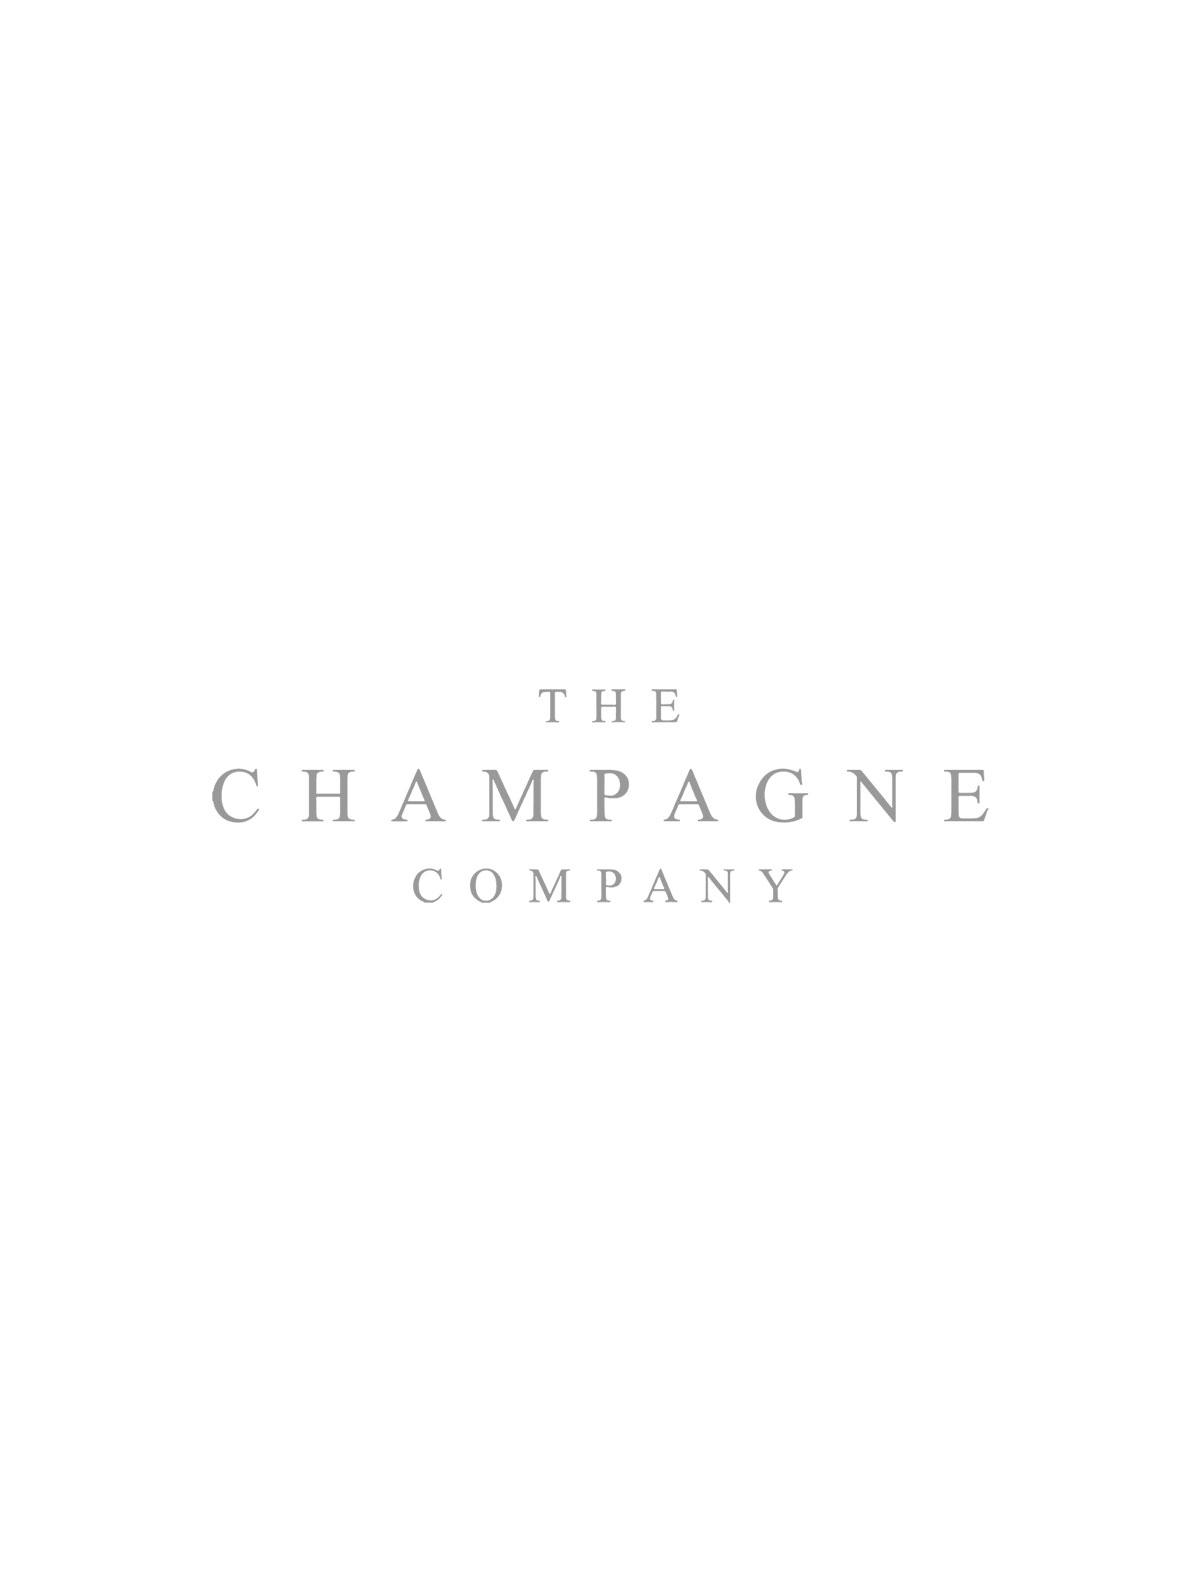 Klein Constantia Cap Classique Brut 2013 Sparkling Wine Gift Box 75cl